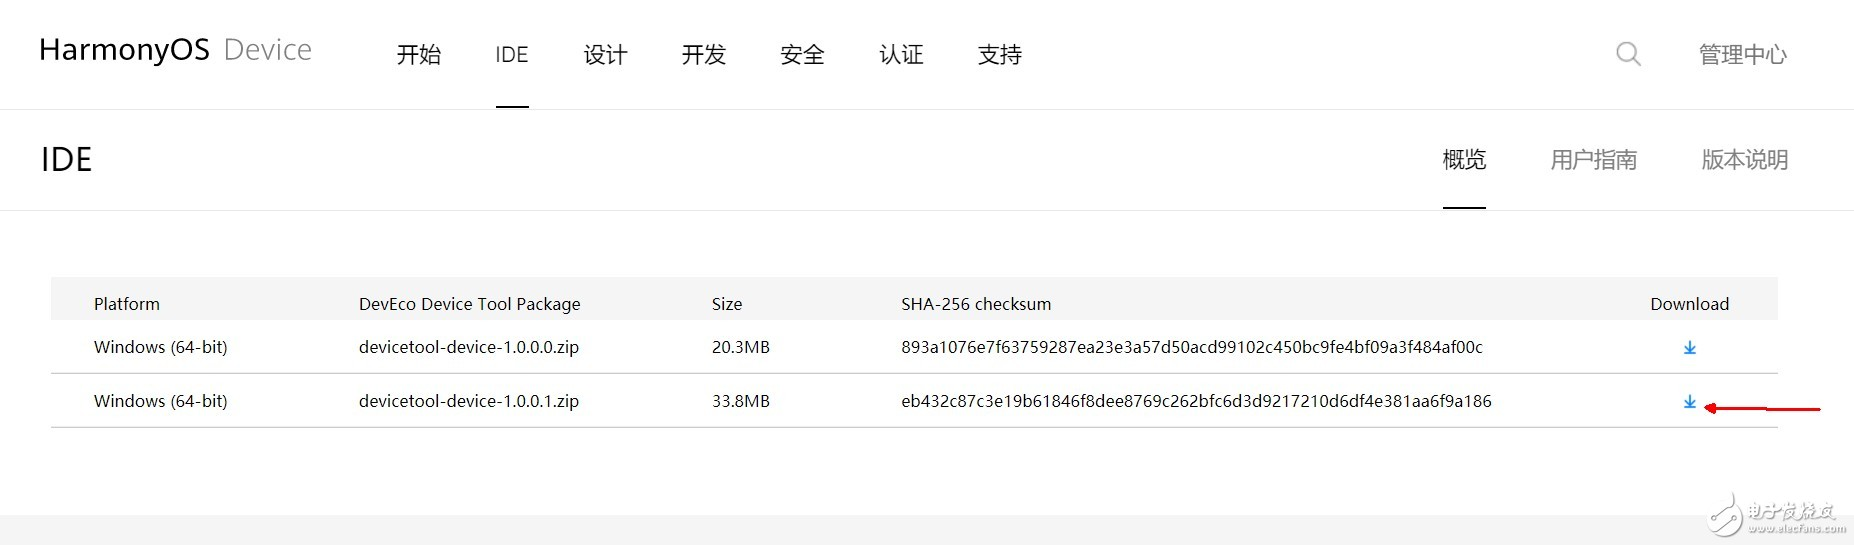 【HarmonyOS HiSpark Wi-Fi IoT 套件试用连载】-2-华为鸿蒙OS之一站式集成开发环境搭建(windows版本)